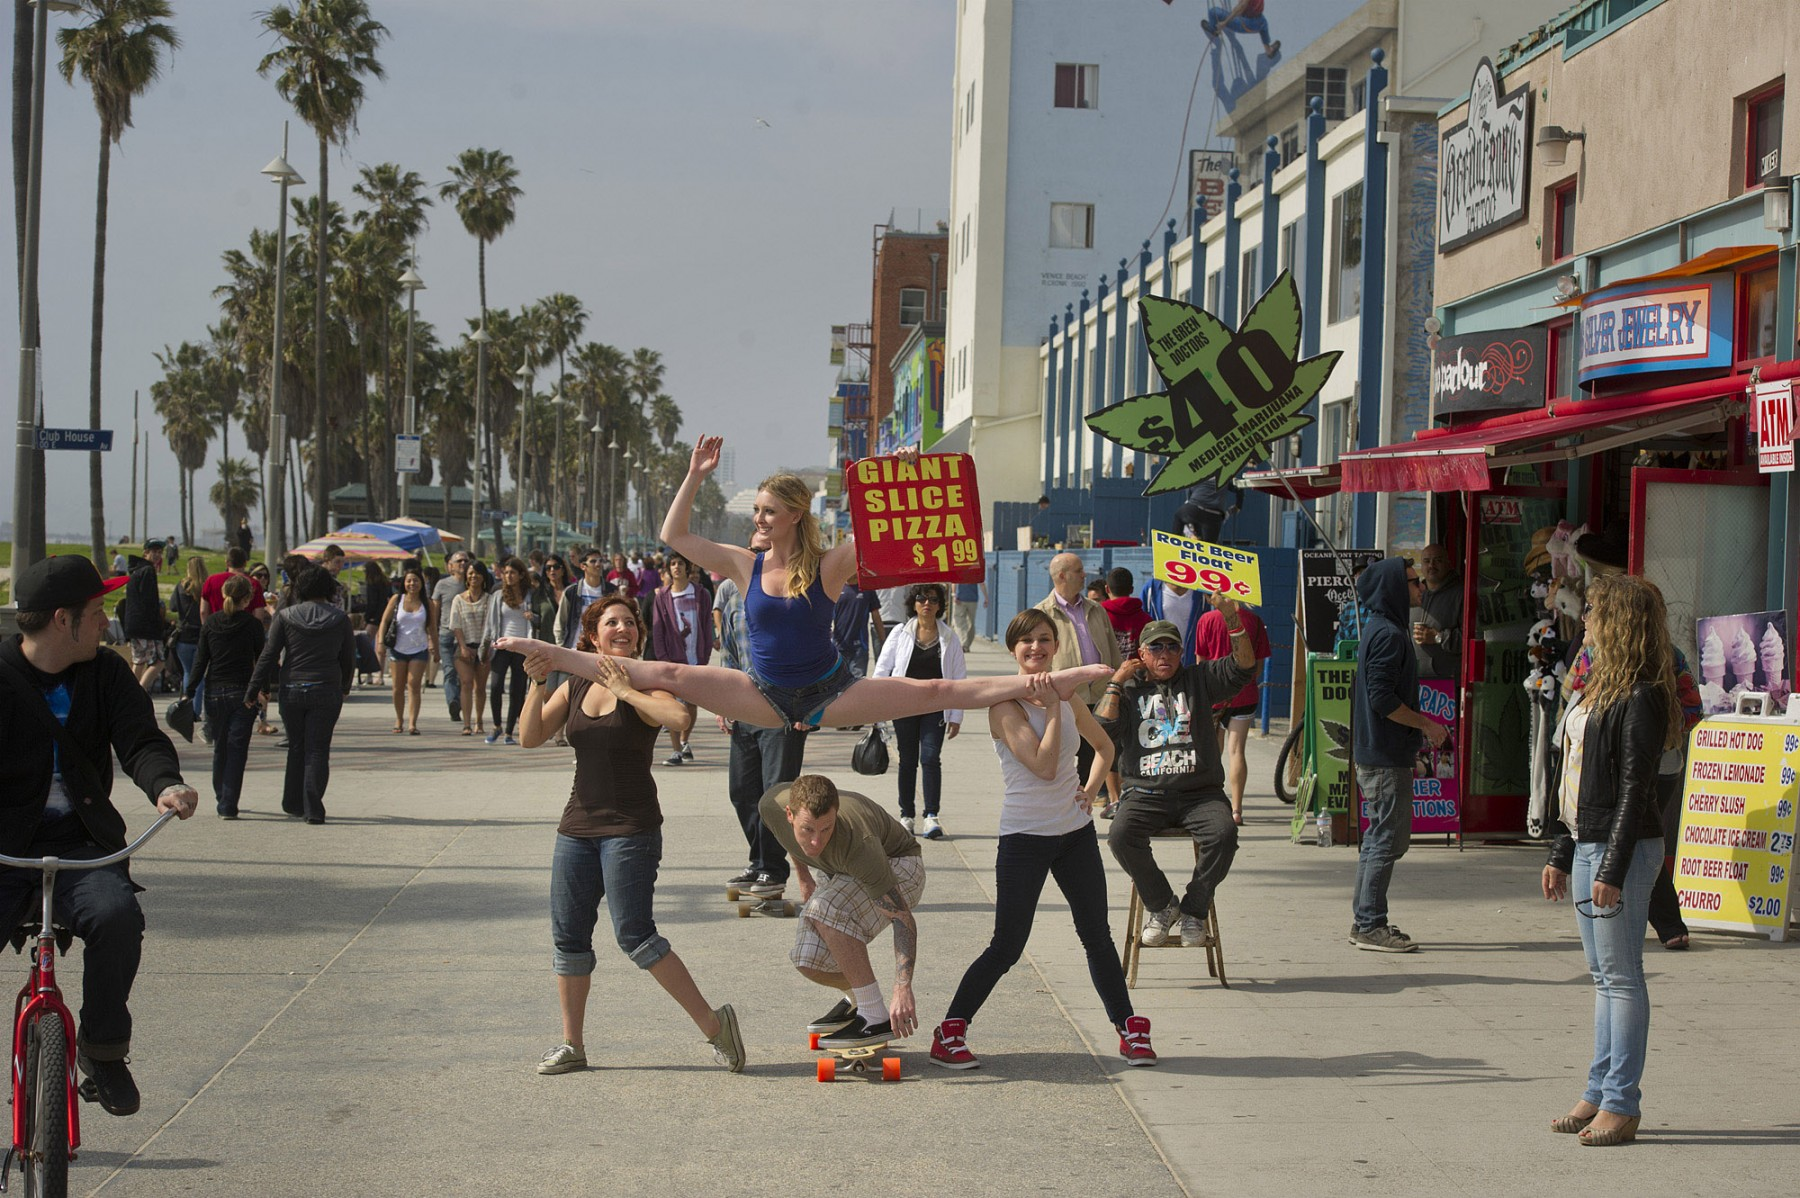 Venice Beach Business For Sale